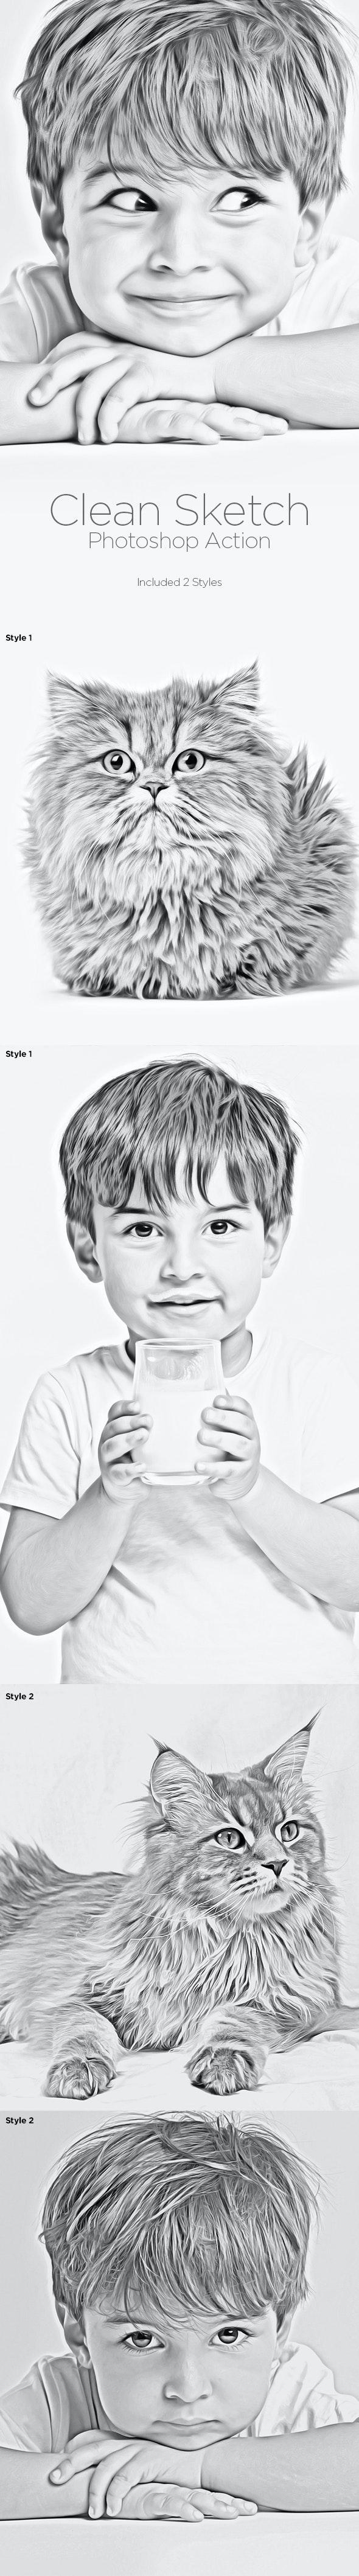 Clean Sketch - Photoshop Action